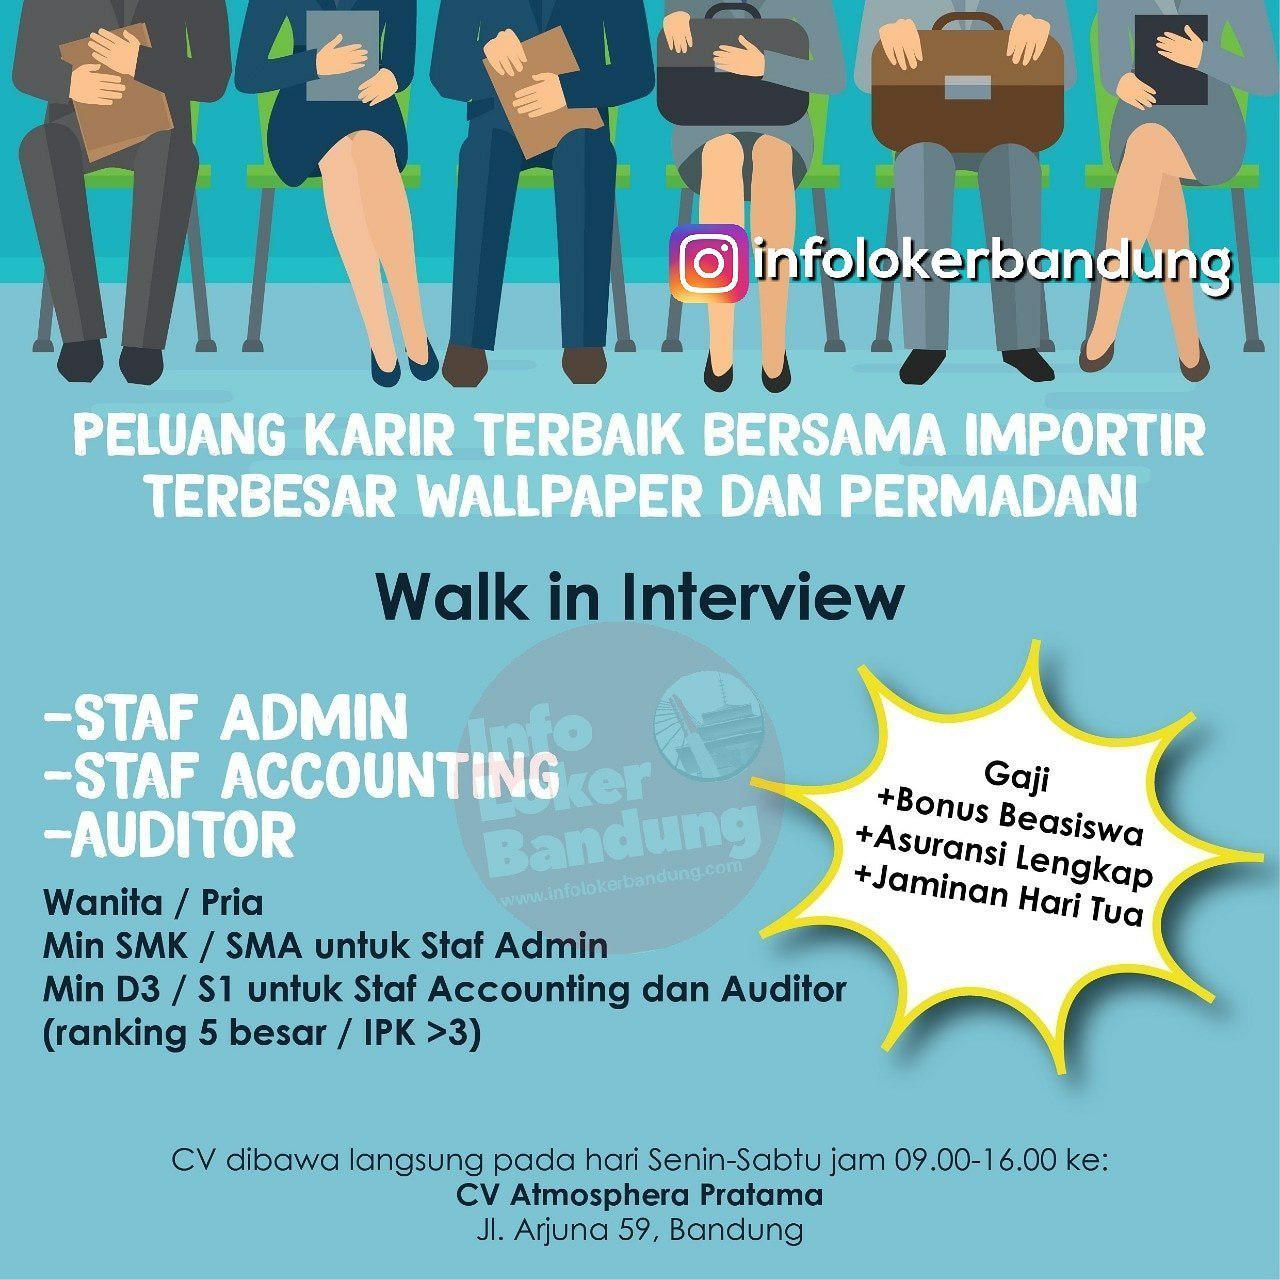 Walk In Interview CV. Atmosphera Pratama Bandung Januari 2019